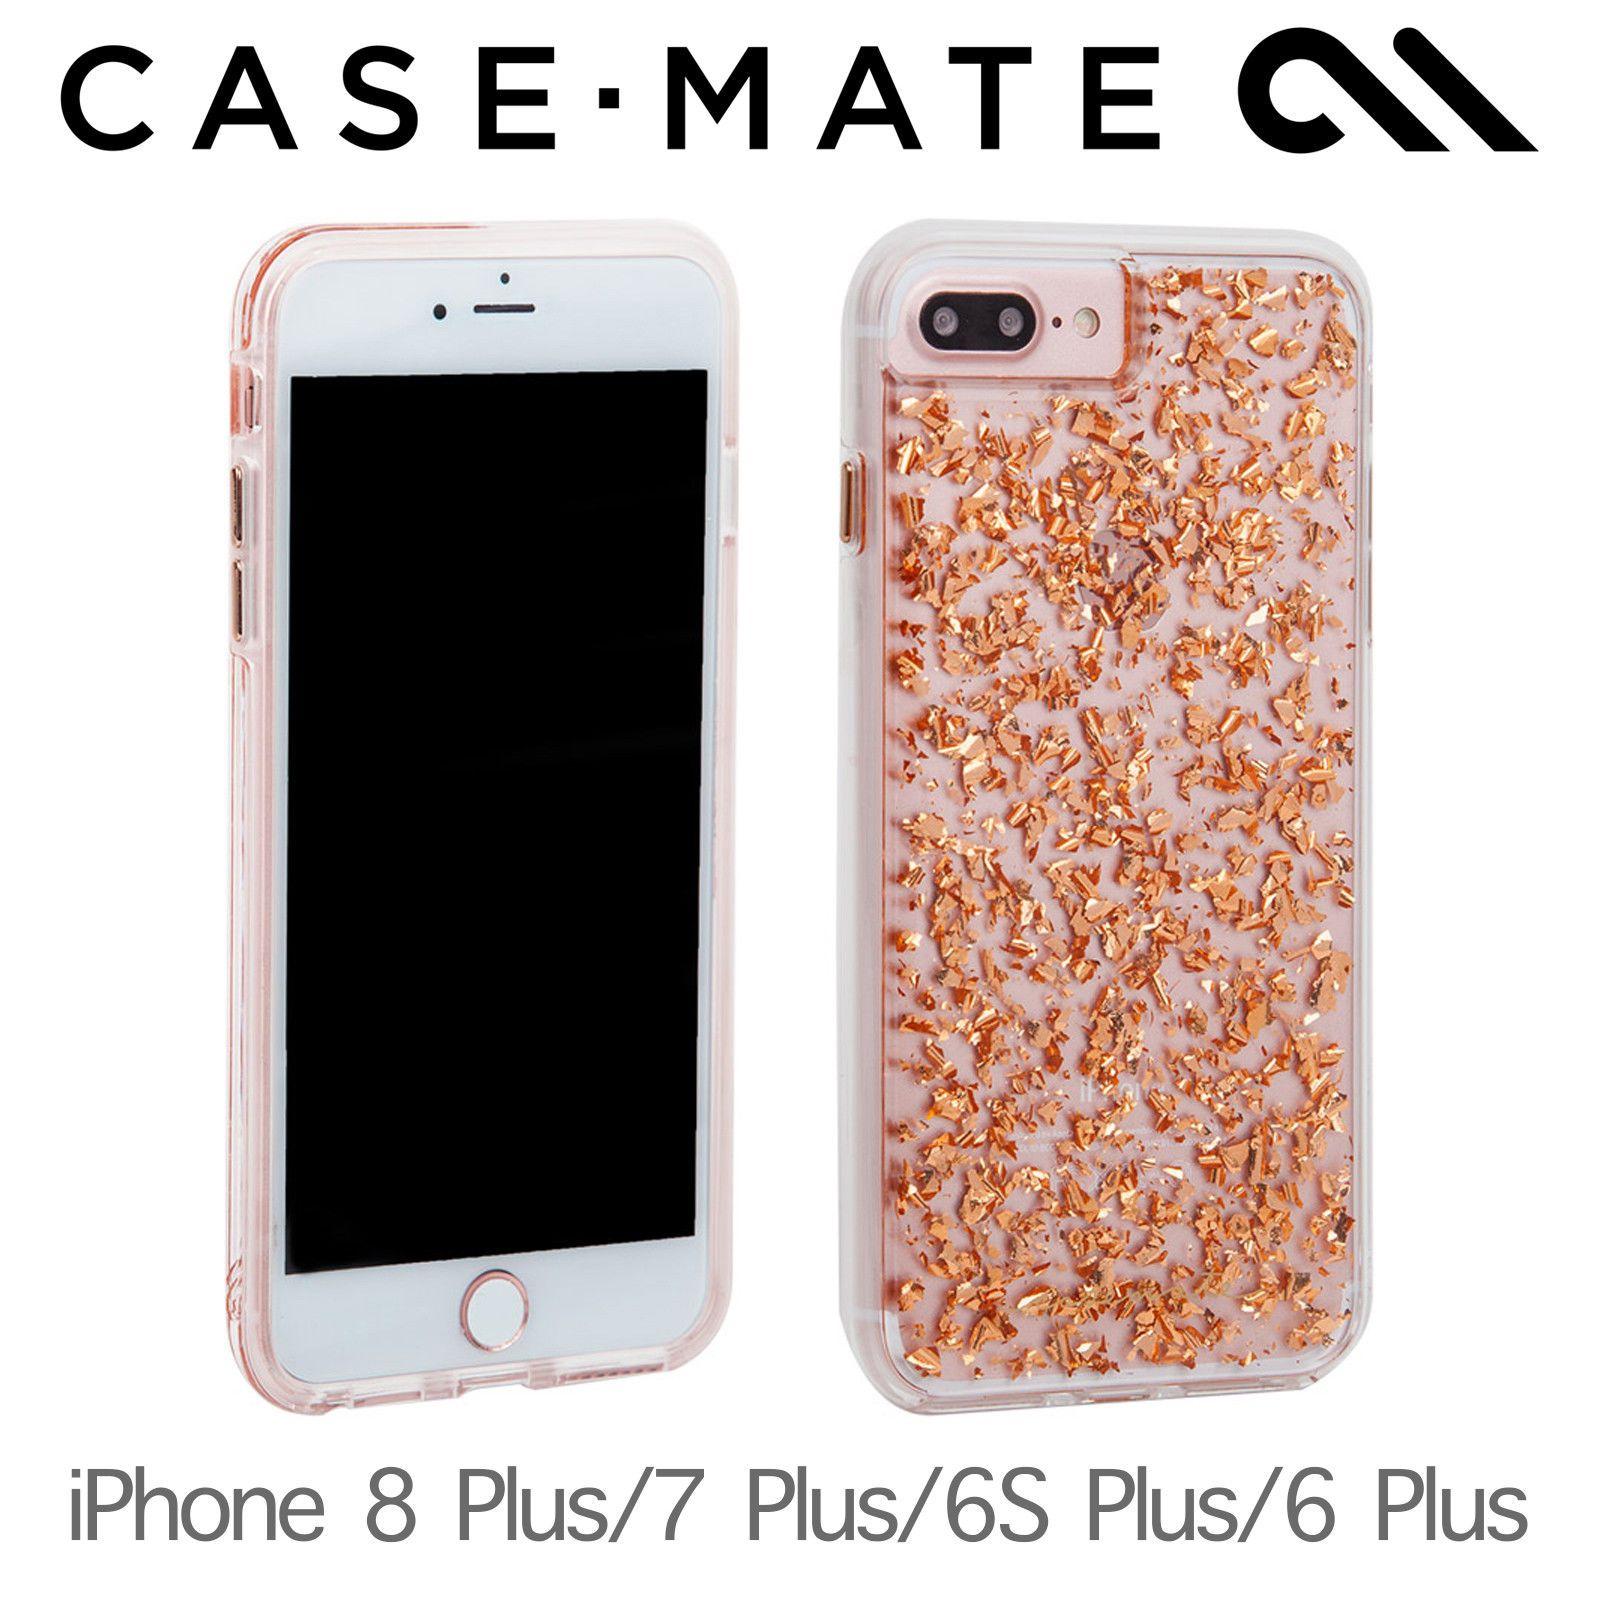 brand new 20854 8905c Details about Case-Mate Karat Case iPhone 8 Plus iPhone 7 Plus 6s ...